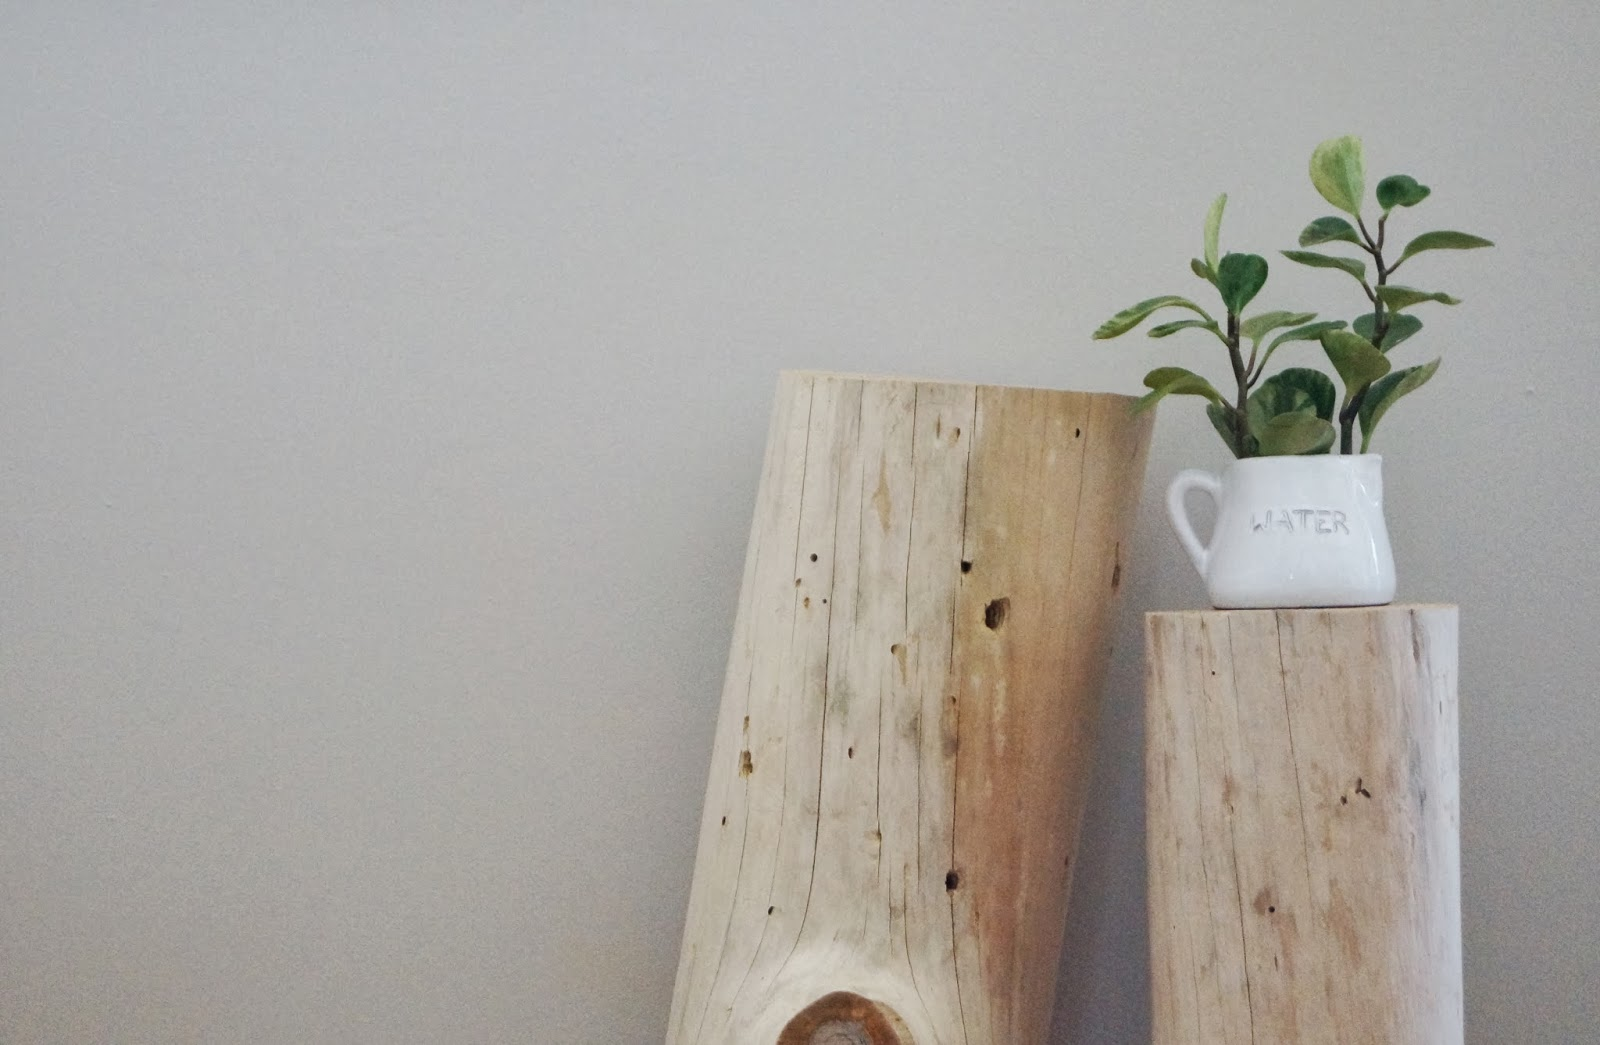 Bleached Tree Stump (7)